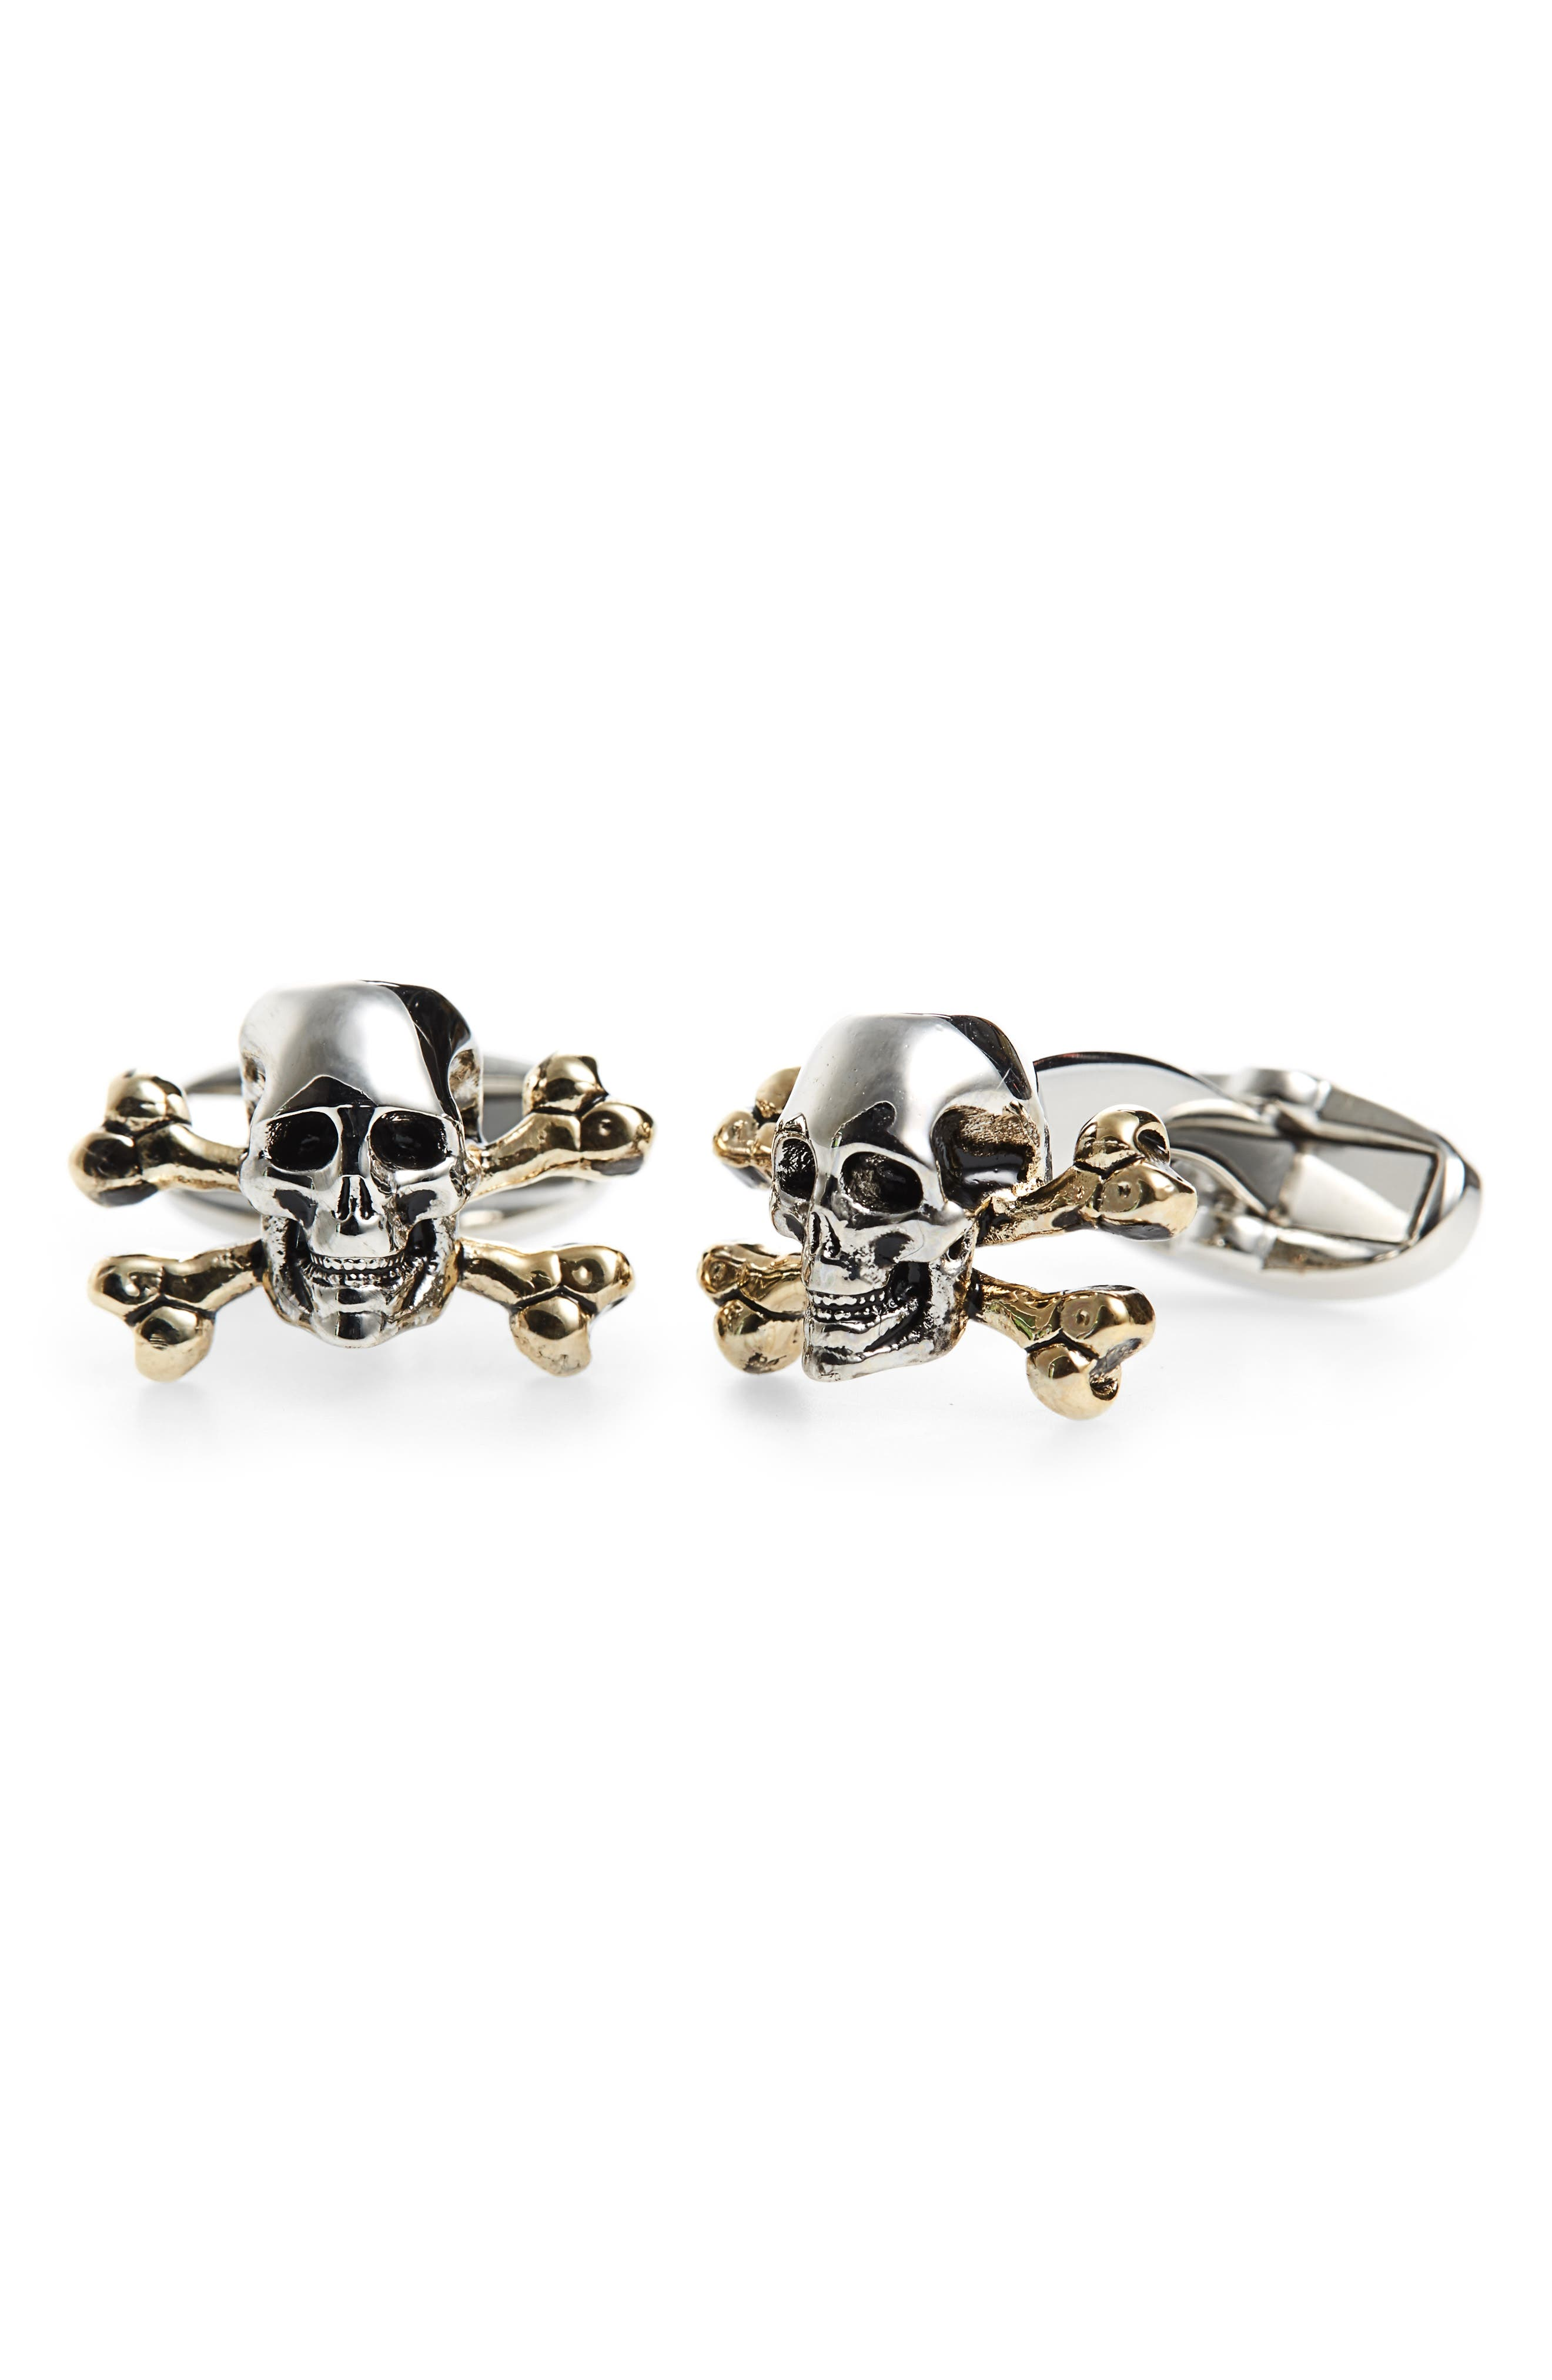 Skull Cuff Links,                         Main,                         color,